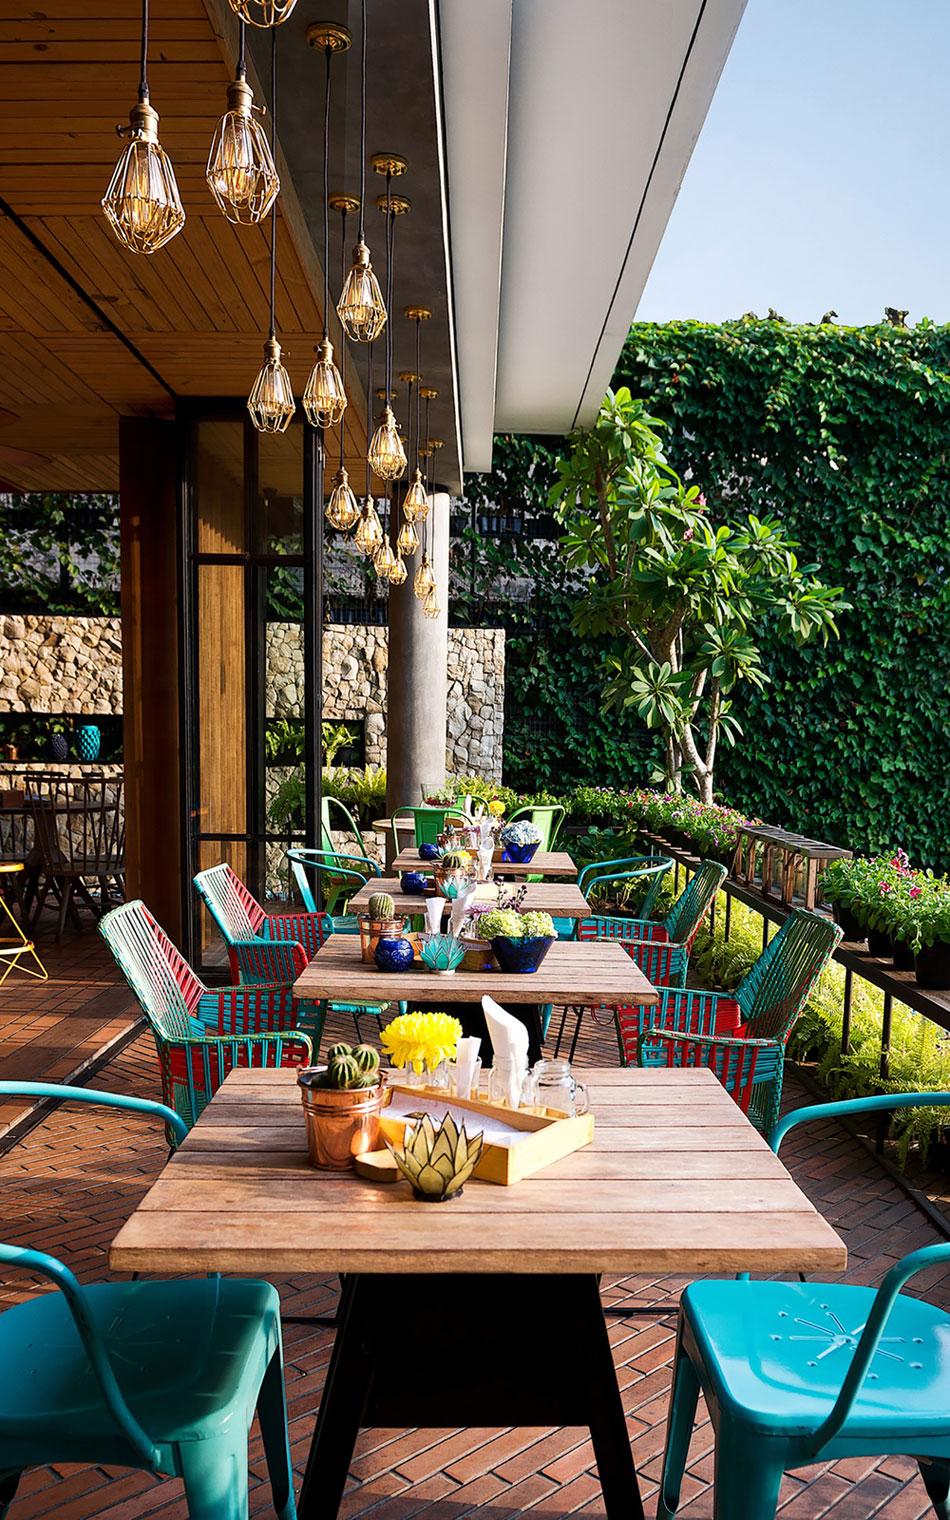 Stylish Tropical Paradise Theme of Lemongrass Restaurant Designed by Einstein & Associates-04